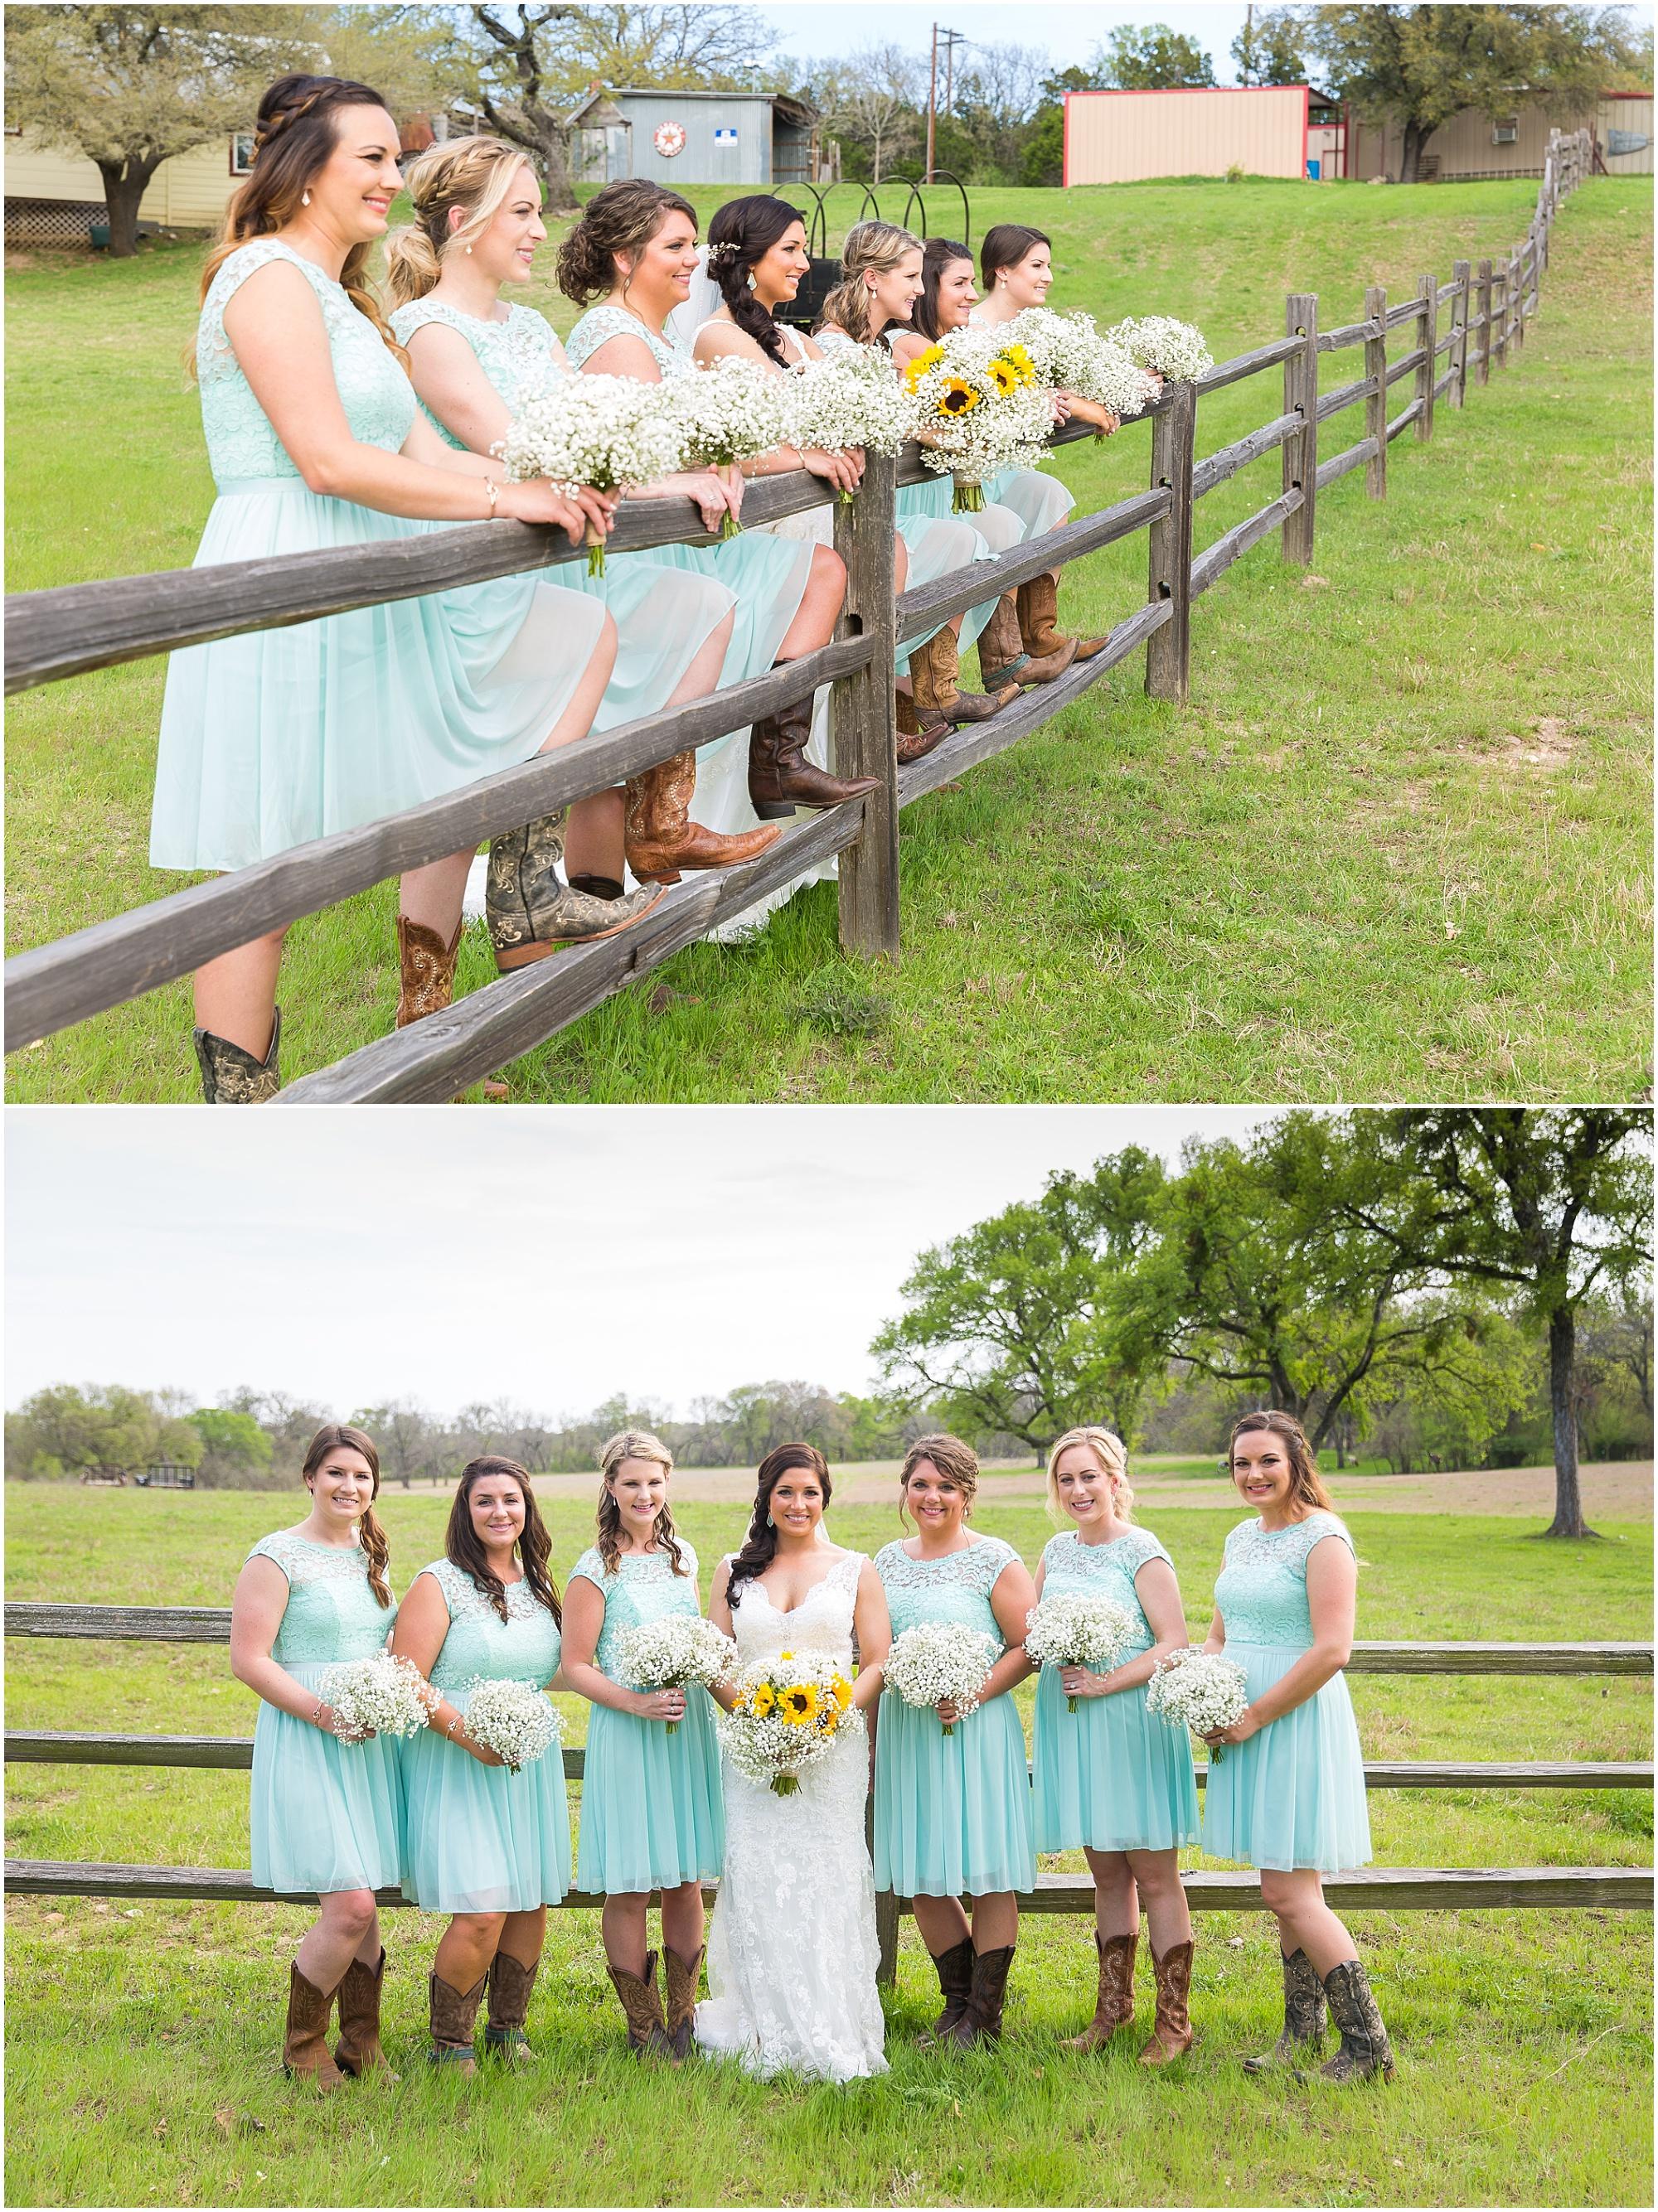 Bride and bridesmaids pose along wooden fence - Jason & Melaina Photography